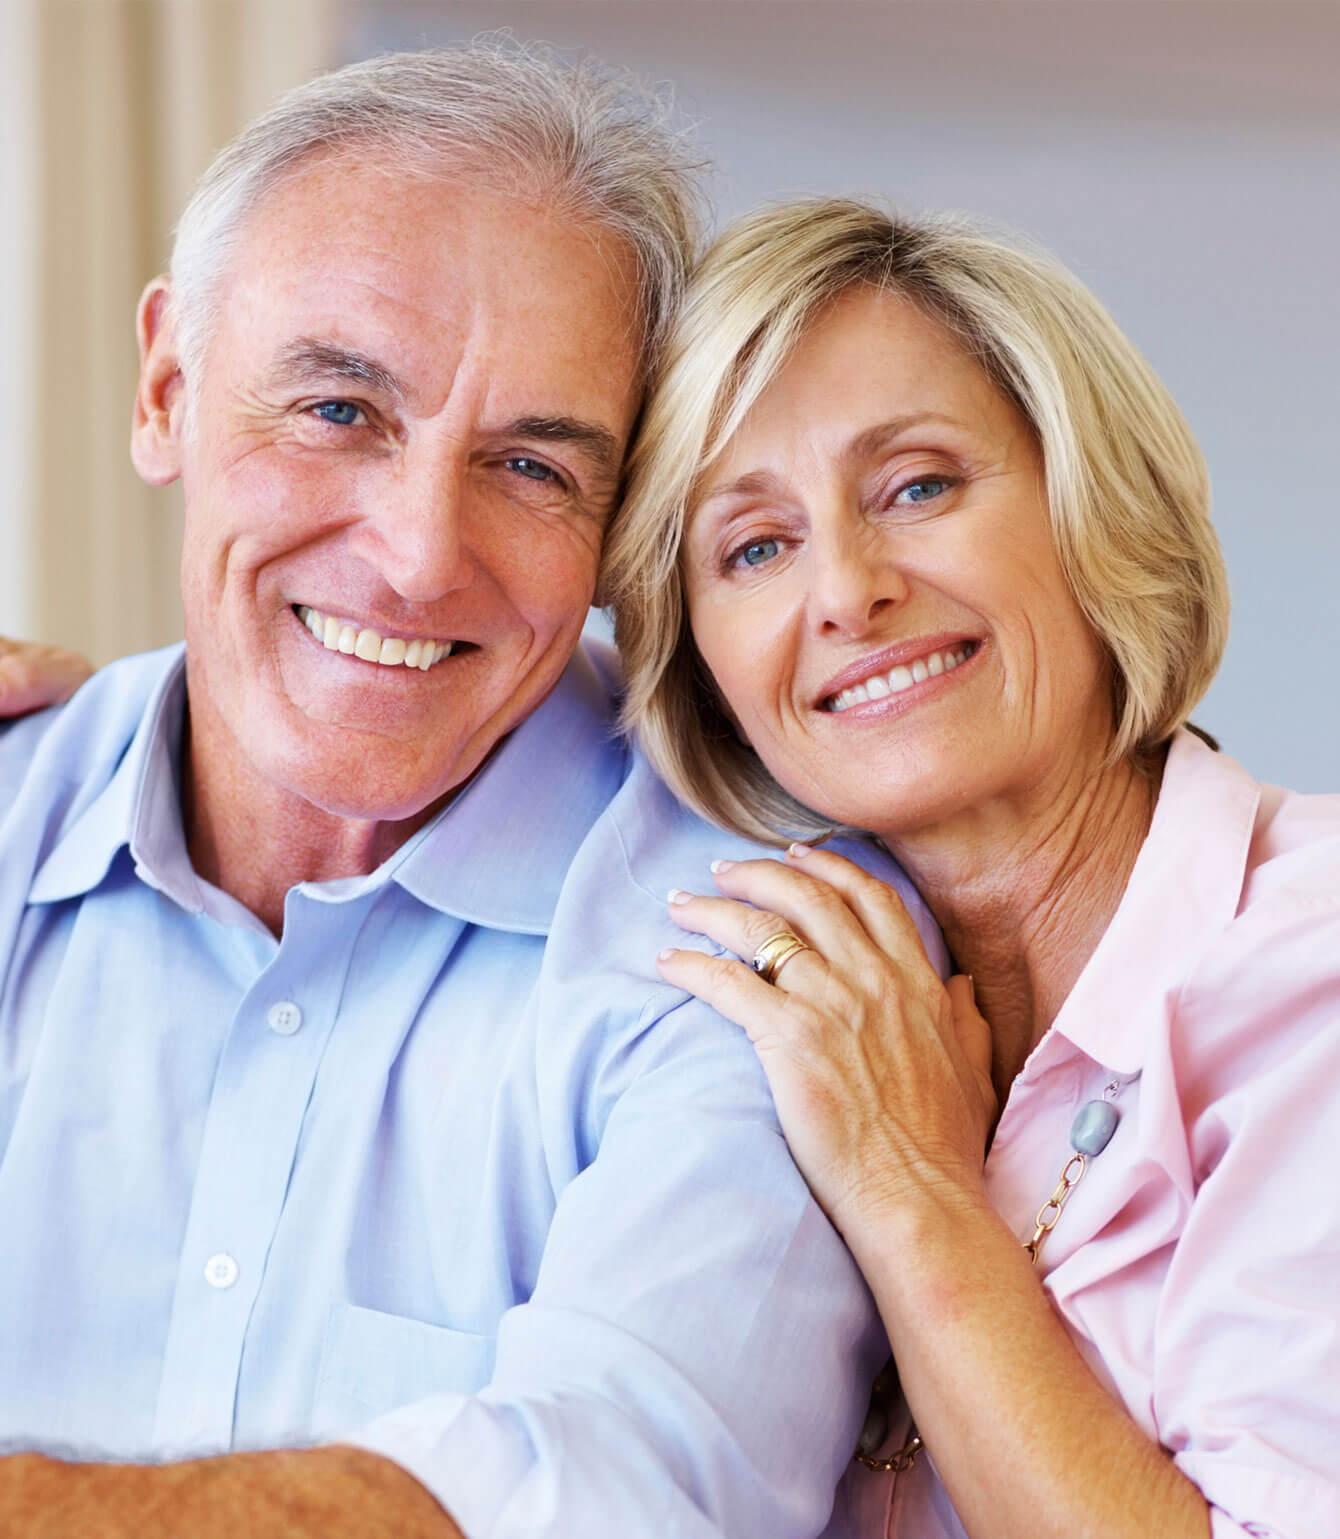 Woodcroft Dental & Implant Clinic